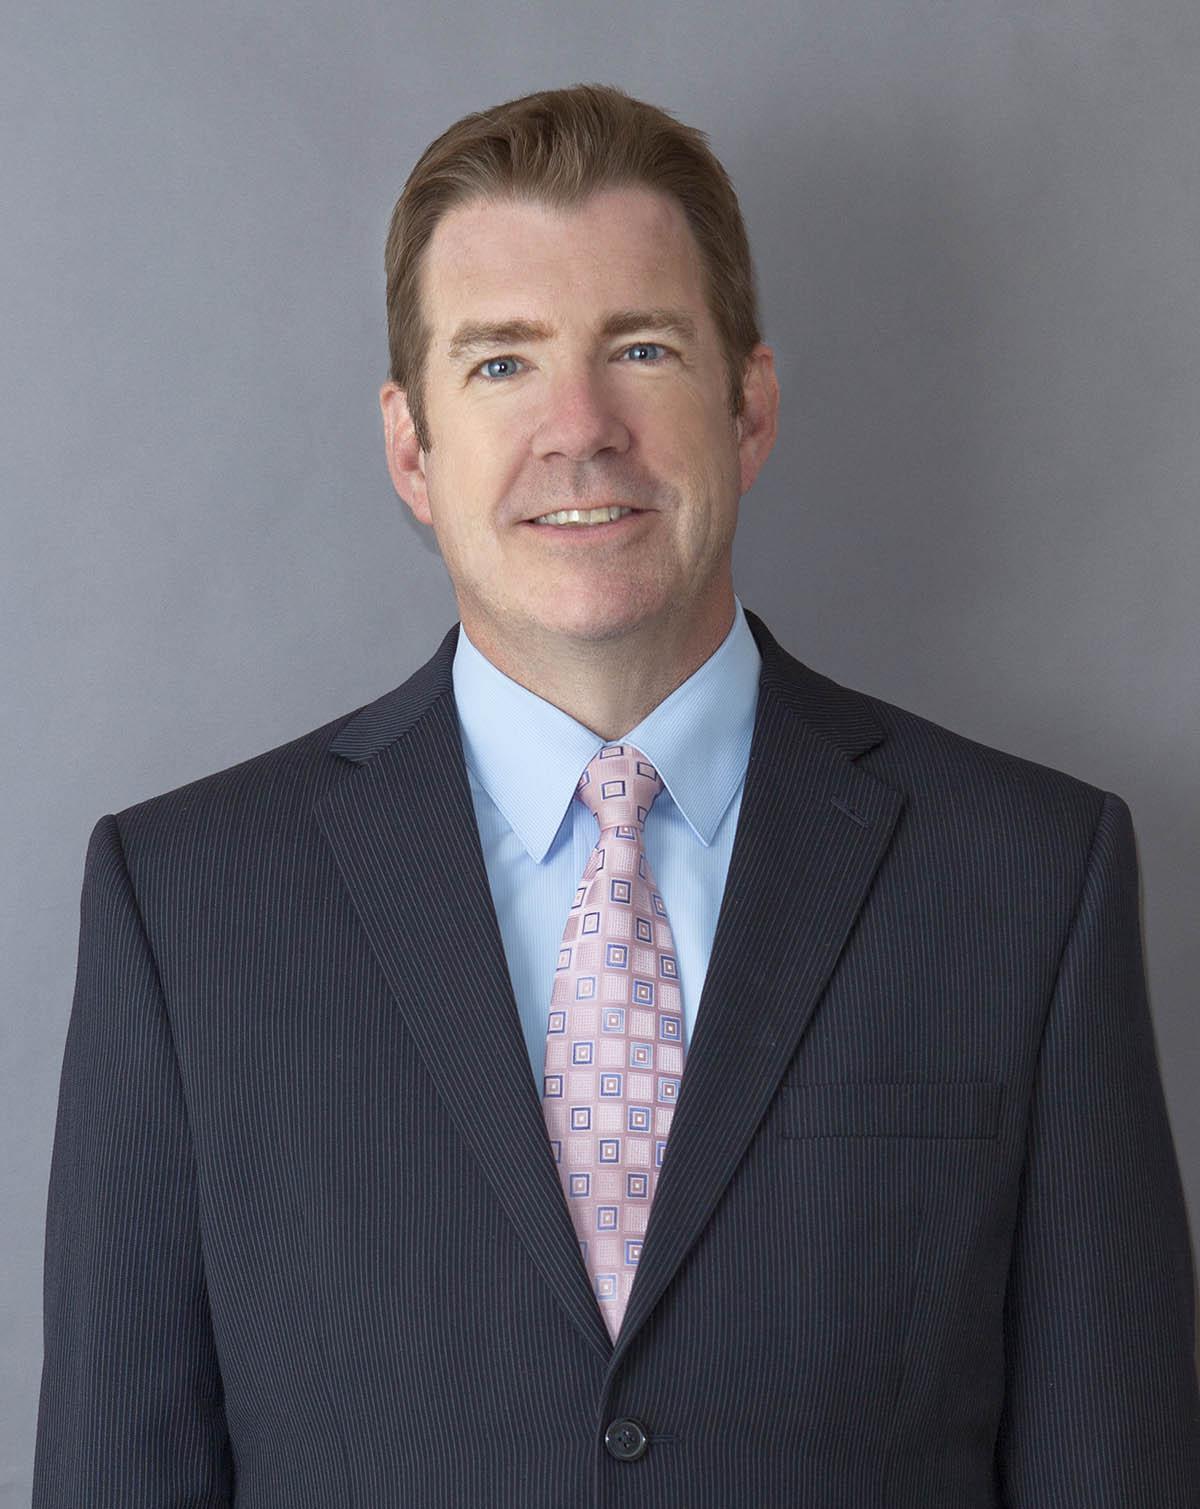 Monona Bank Business Banker Ted Gunderson